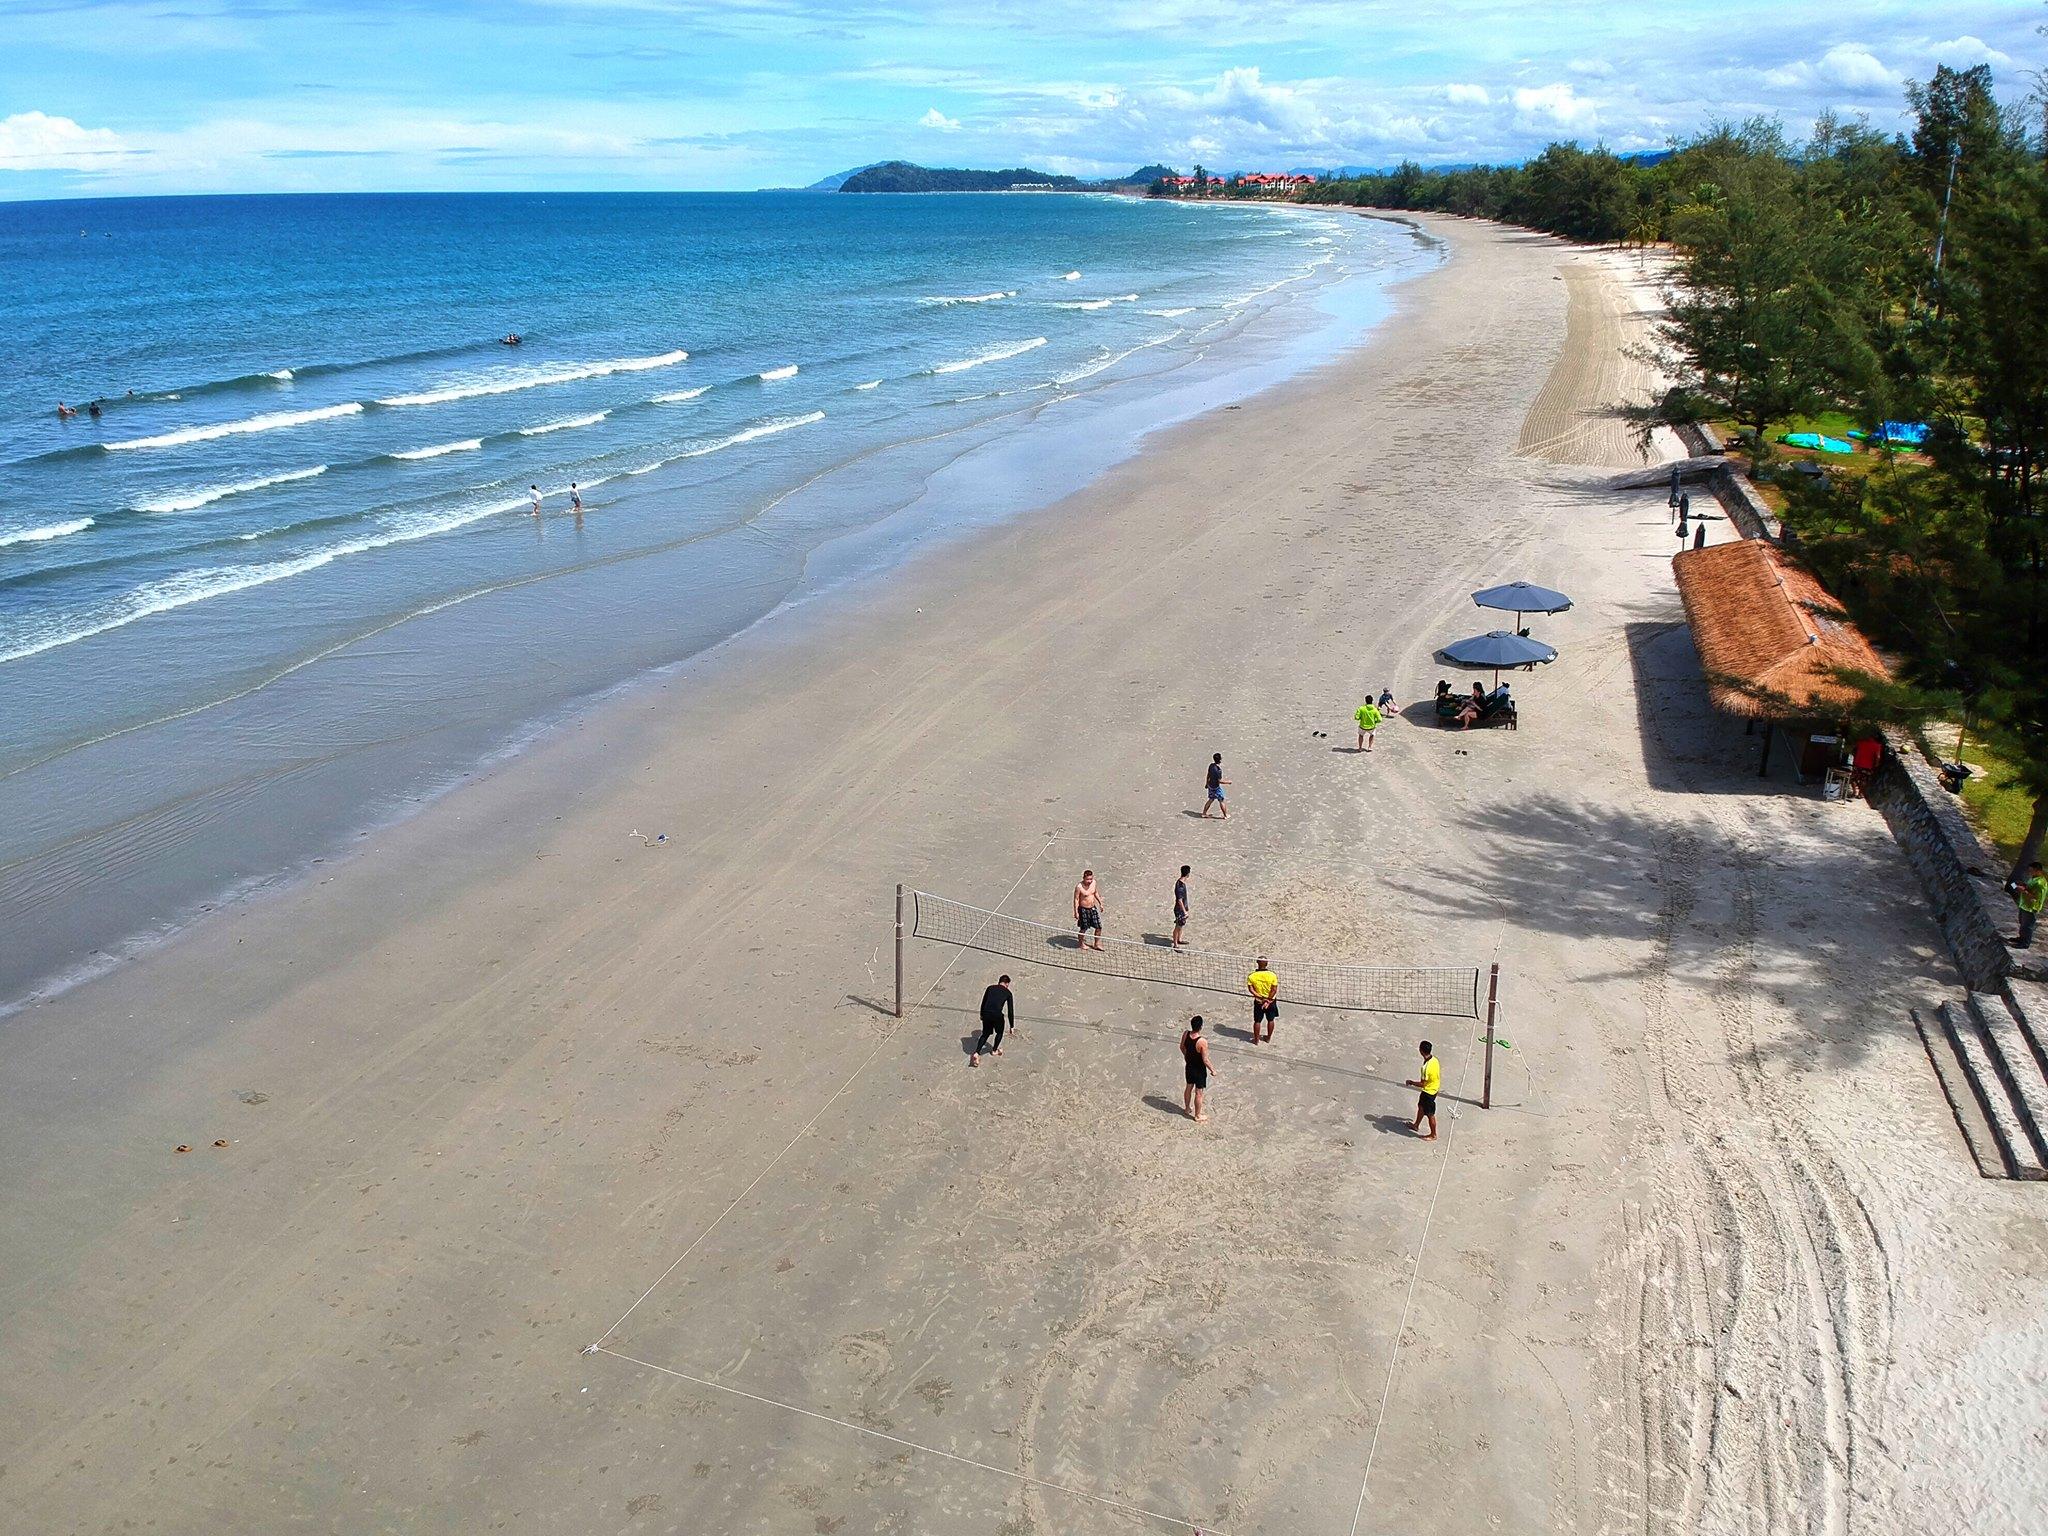 ...or having fun on the Nexus private beach, the longest in Malaysia